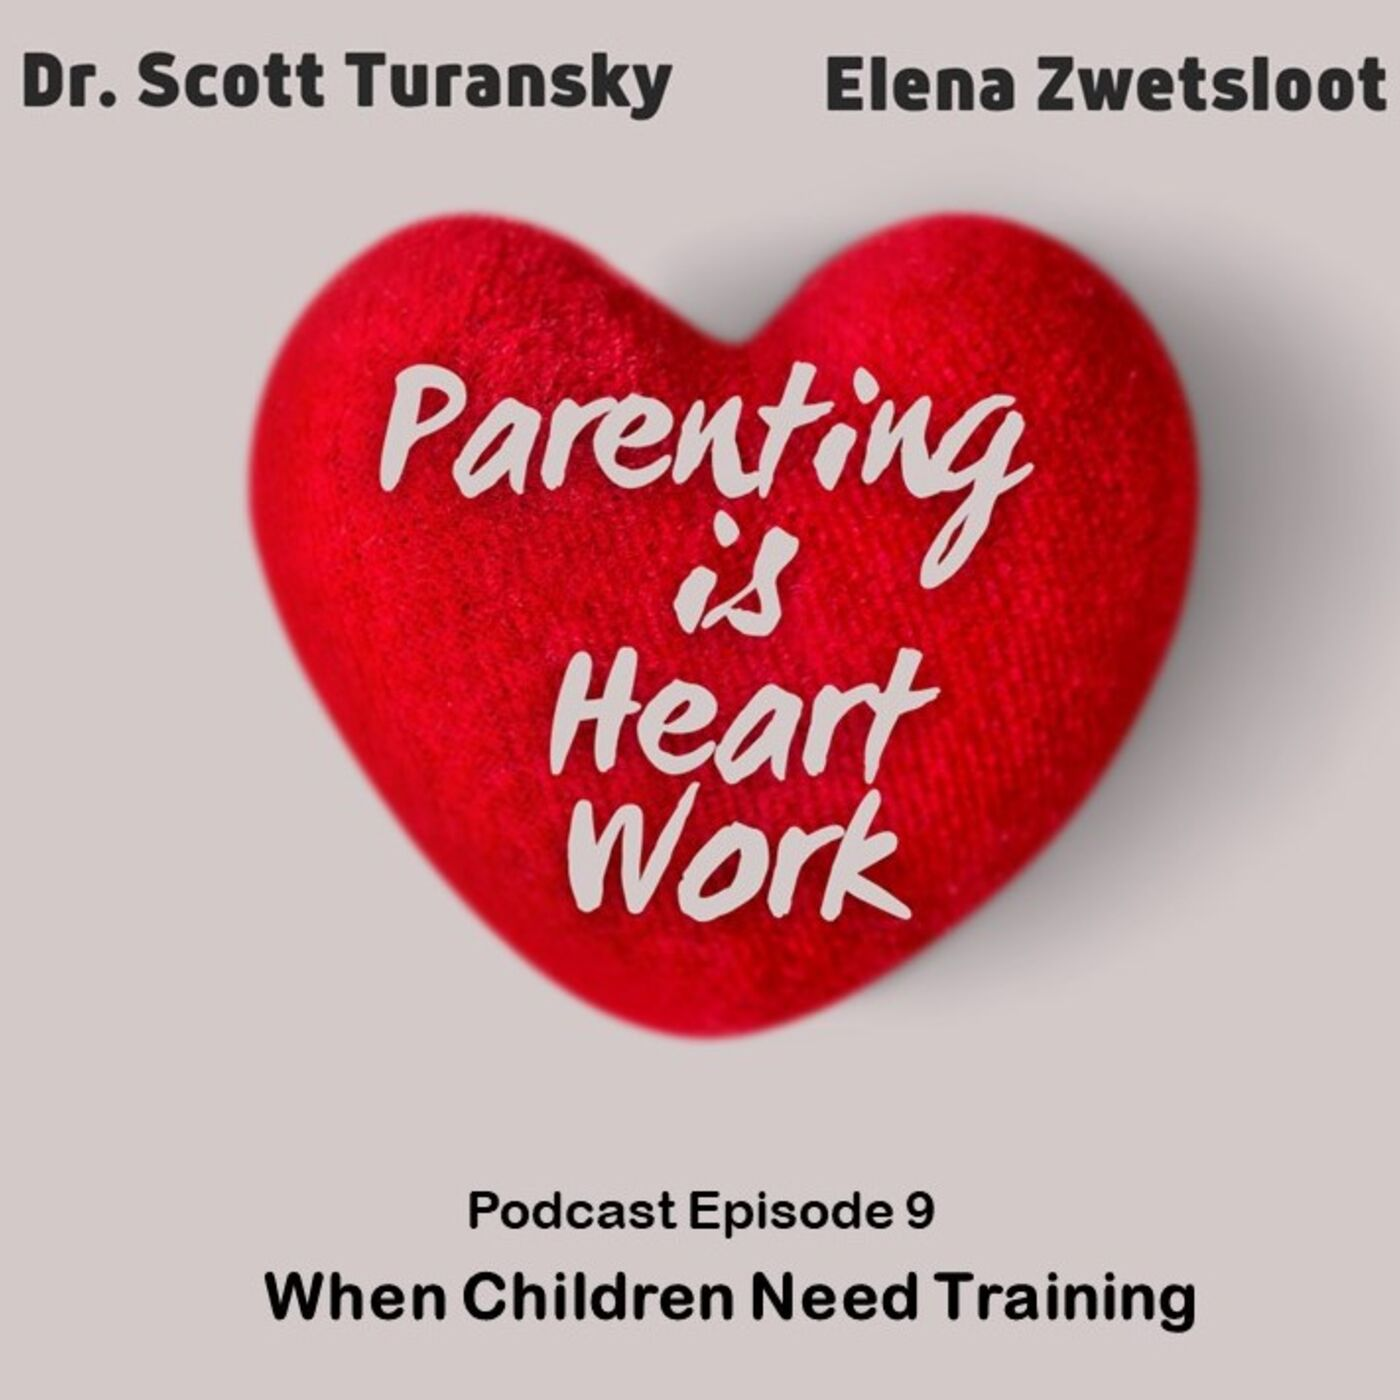 8. When Children Need Training